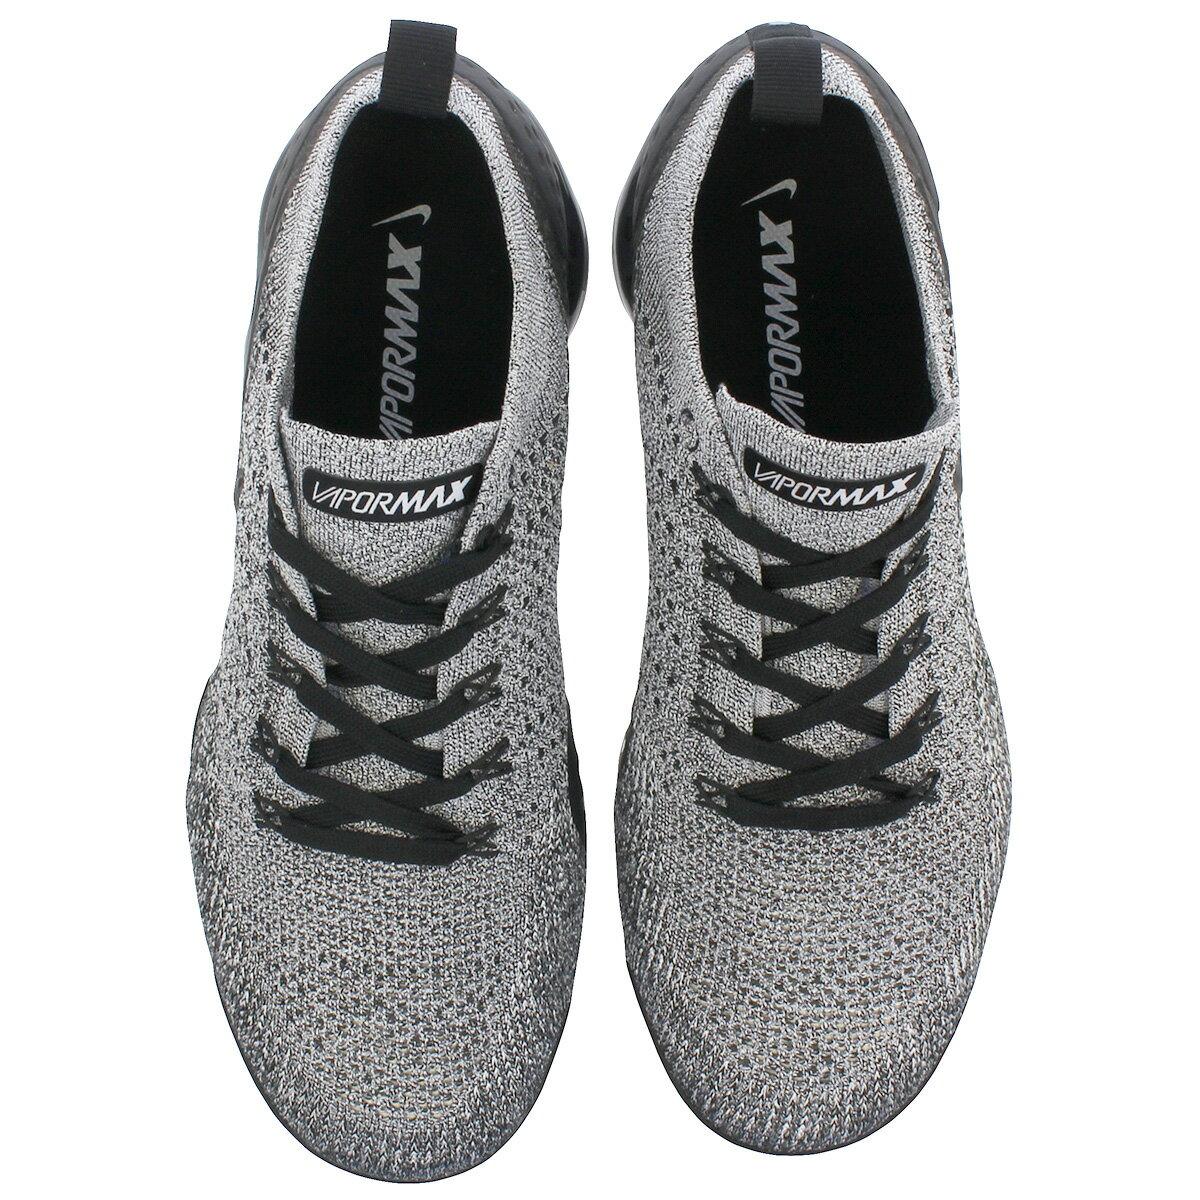 NIKE AIR VAPORMAX FLYKNIT 2 Nike vapor max fried food knit 2 WHITEBLACKBLACK 942,842 107